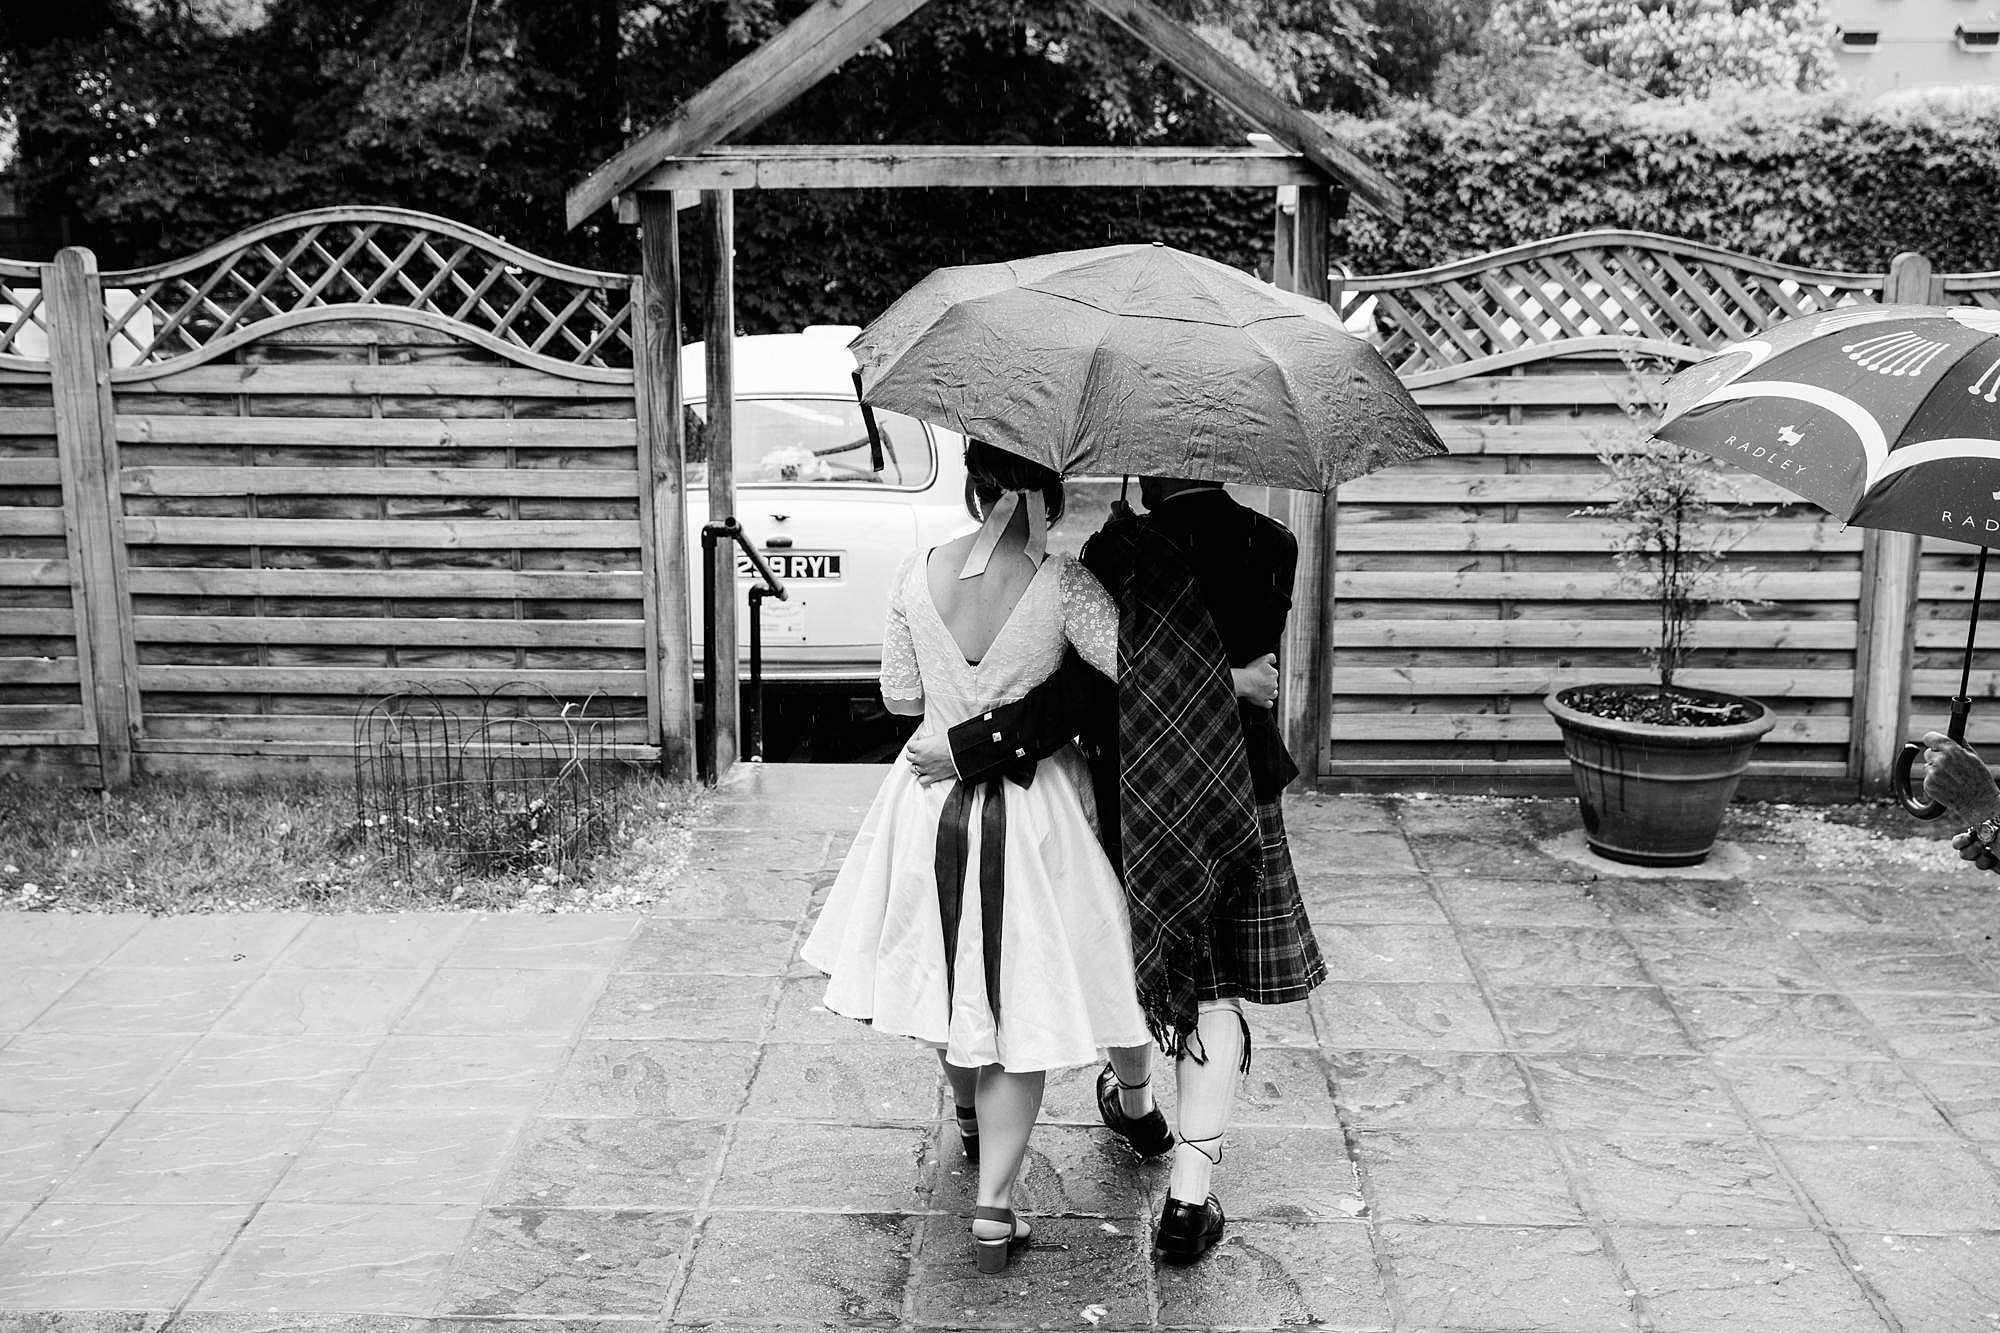 #southlondonwedding #brunelmuesum #brunelmuseumwedding #brunelmesumweddingphotography #outdoorwedding #londonwedding #londonweddingphotographer #funwedding #funweddingphotographer #bohobride #documentarywedding #laidbackwedding #londonpubwedding #londonweddingphotography #southlondonweddingphotography #weddingphotographerlondon #weddingphotographylondon #townhallwedding #weddingmoments #belovedstories #huffpostido #pubweddinglondon #londonweddings #londonweddinginspo #londonweddinginspiration #funnywedding #londonbride #bridelondon #londonweddings #2020wedding bride and groom walking away under an umbrella